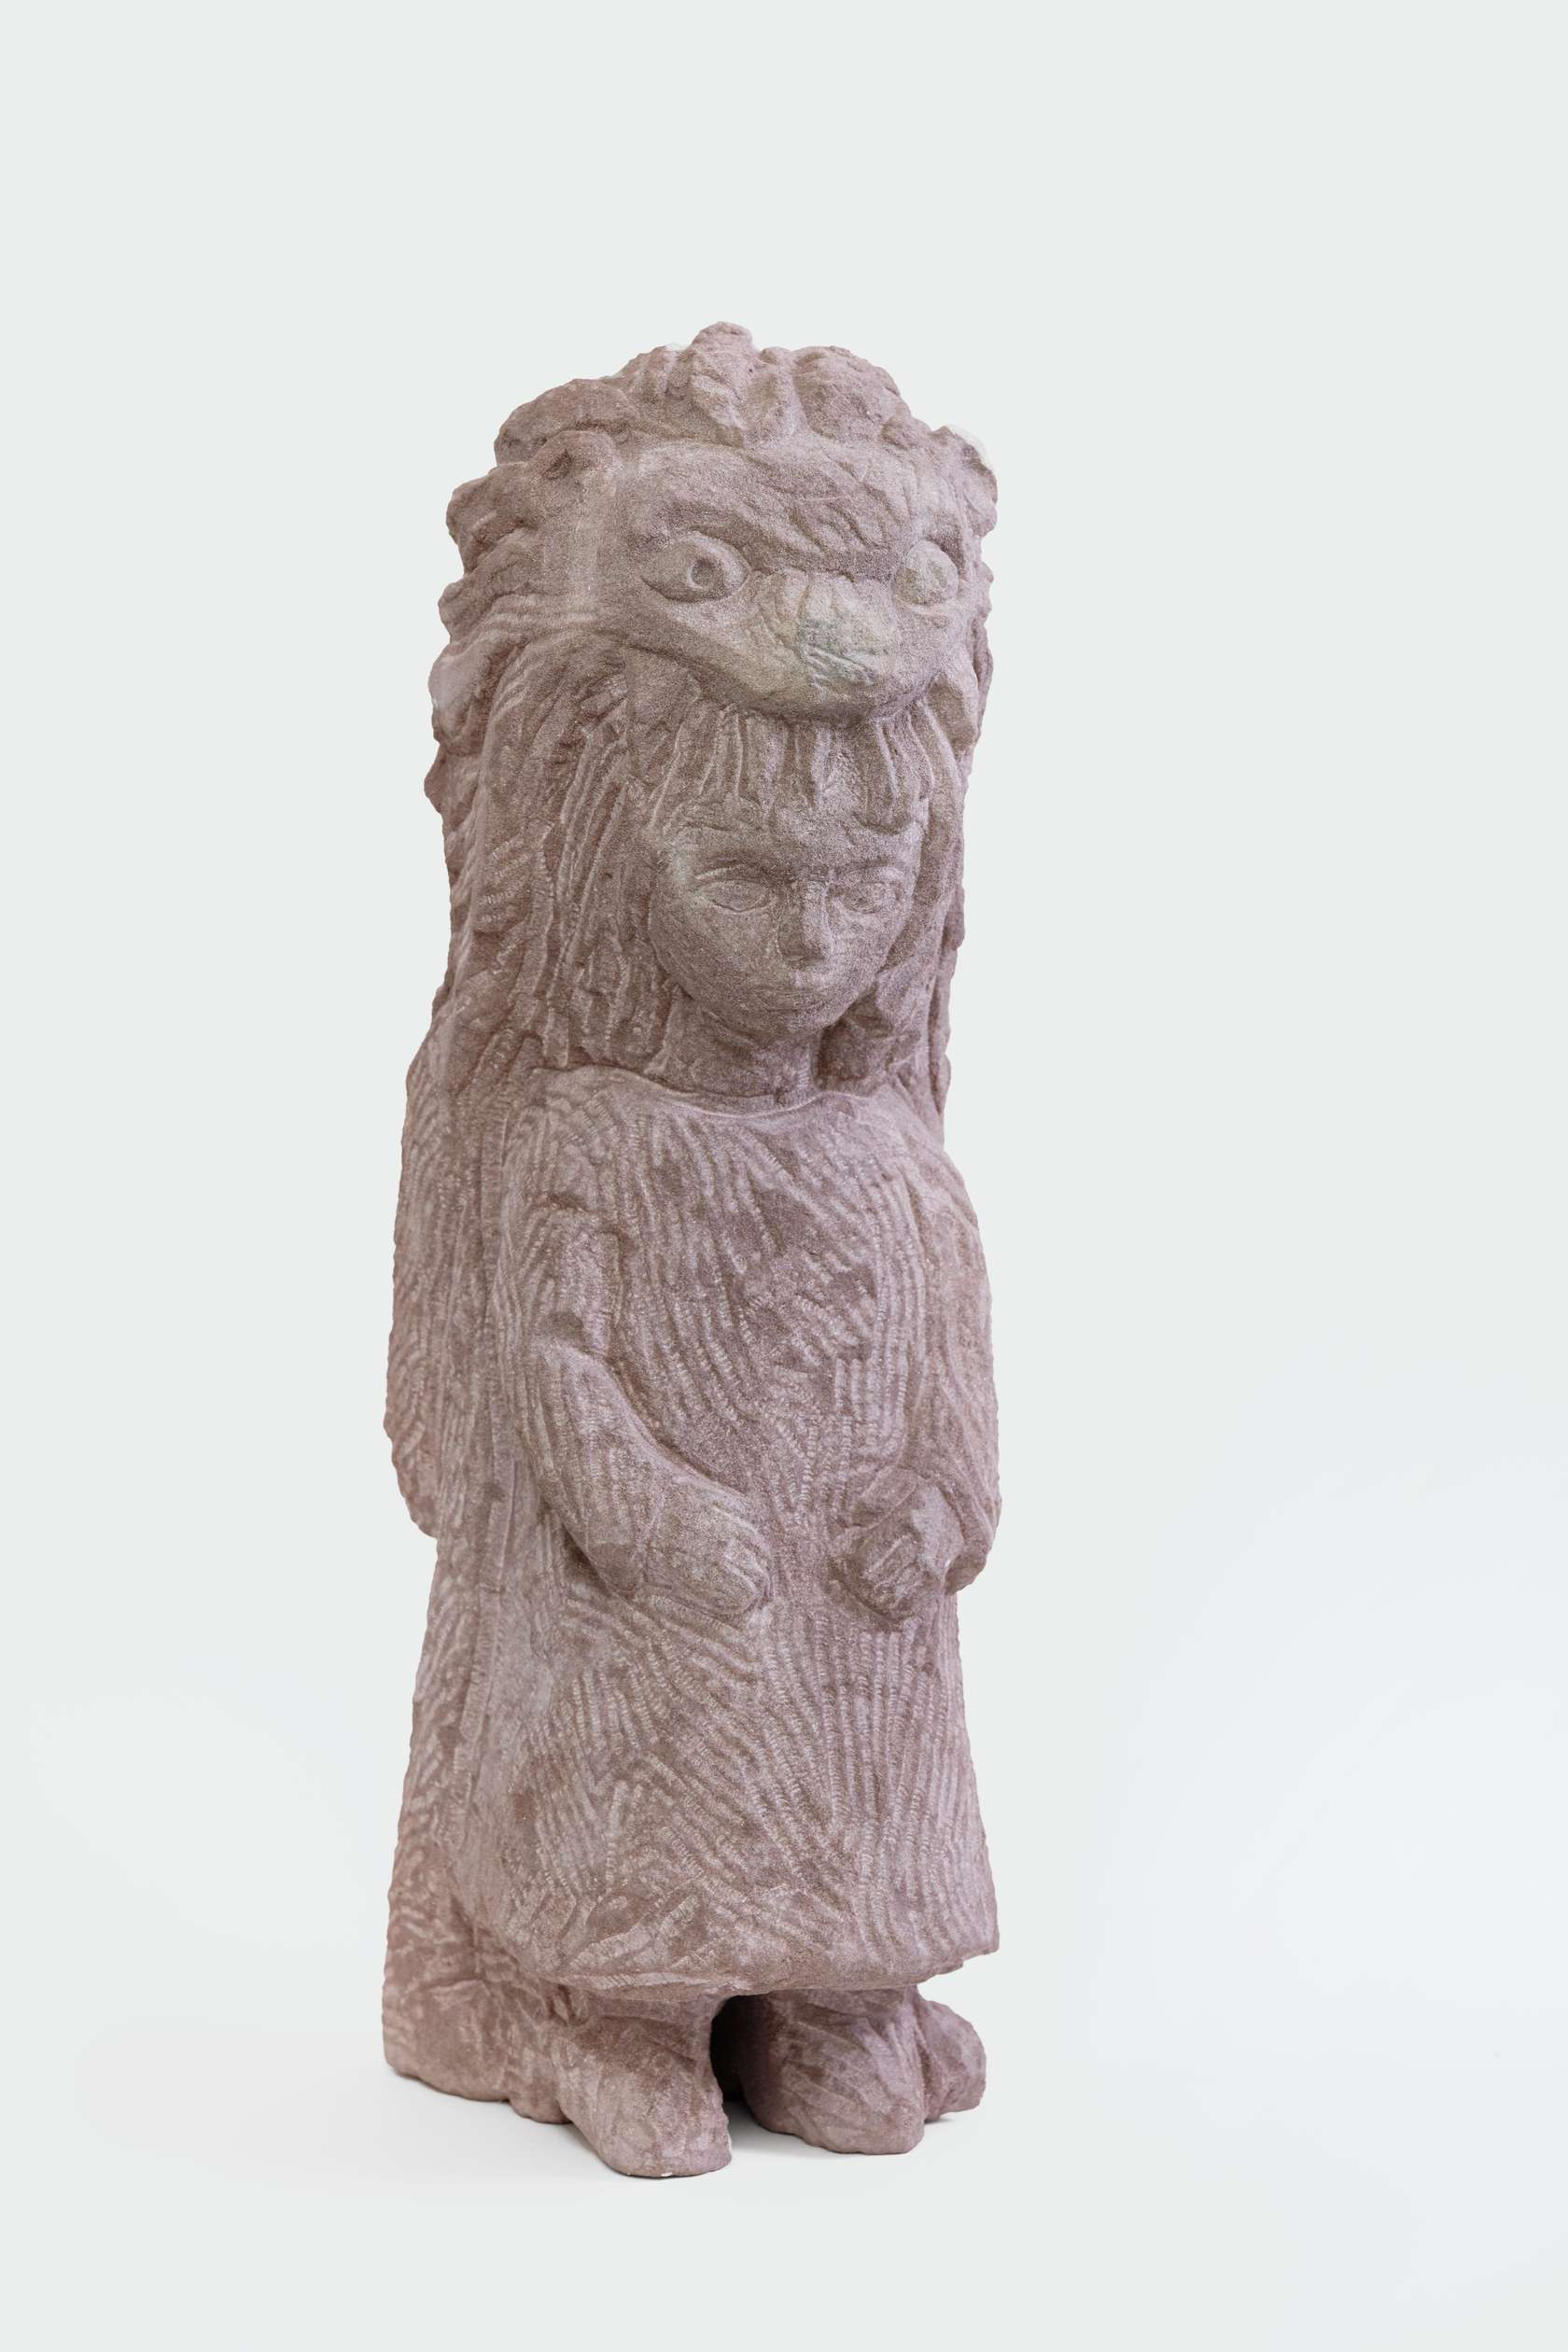 Stefan Rinck, Girl with Lioncoat, 2015 Grès42 × 18 × 15 cm / 16 1/2 × 7 1/8 × 5 7/8 in.